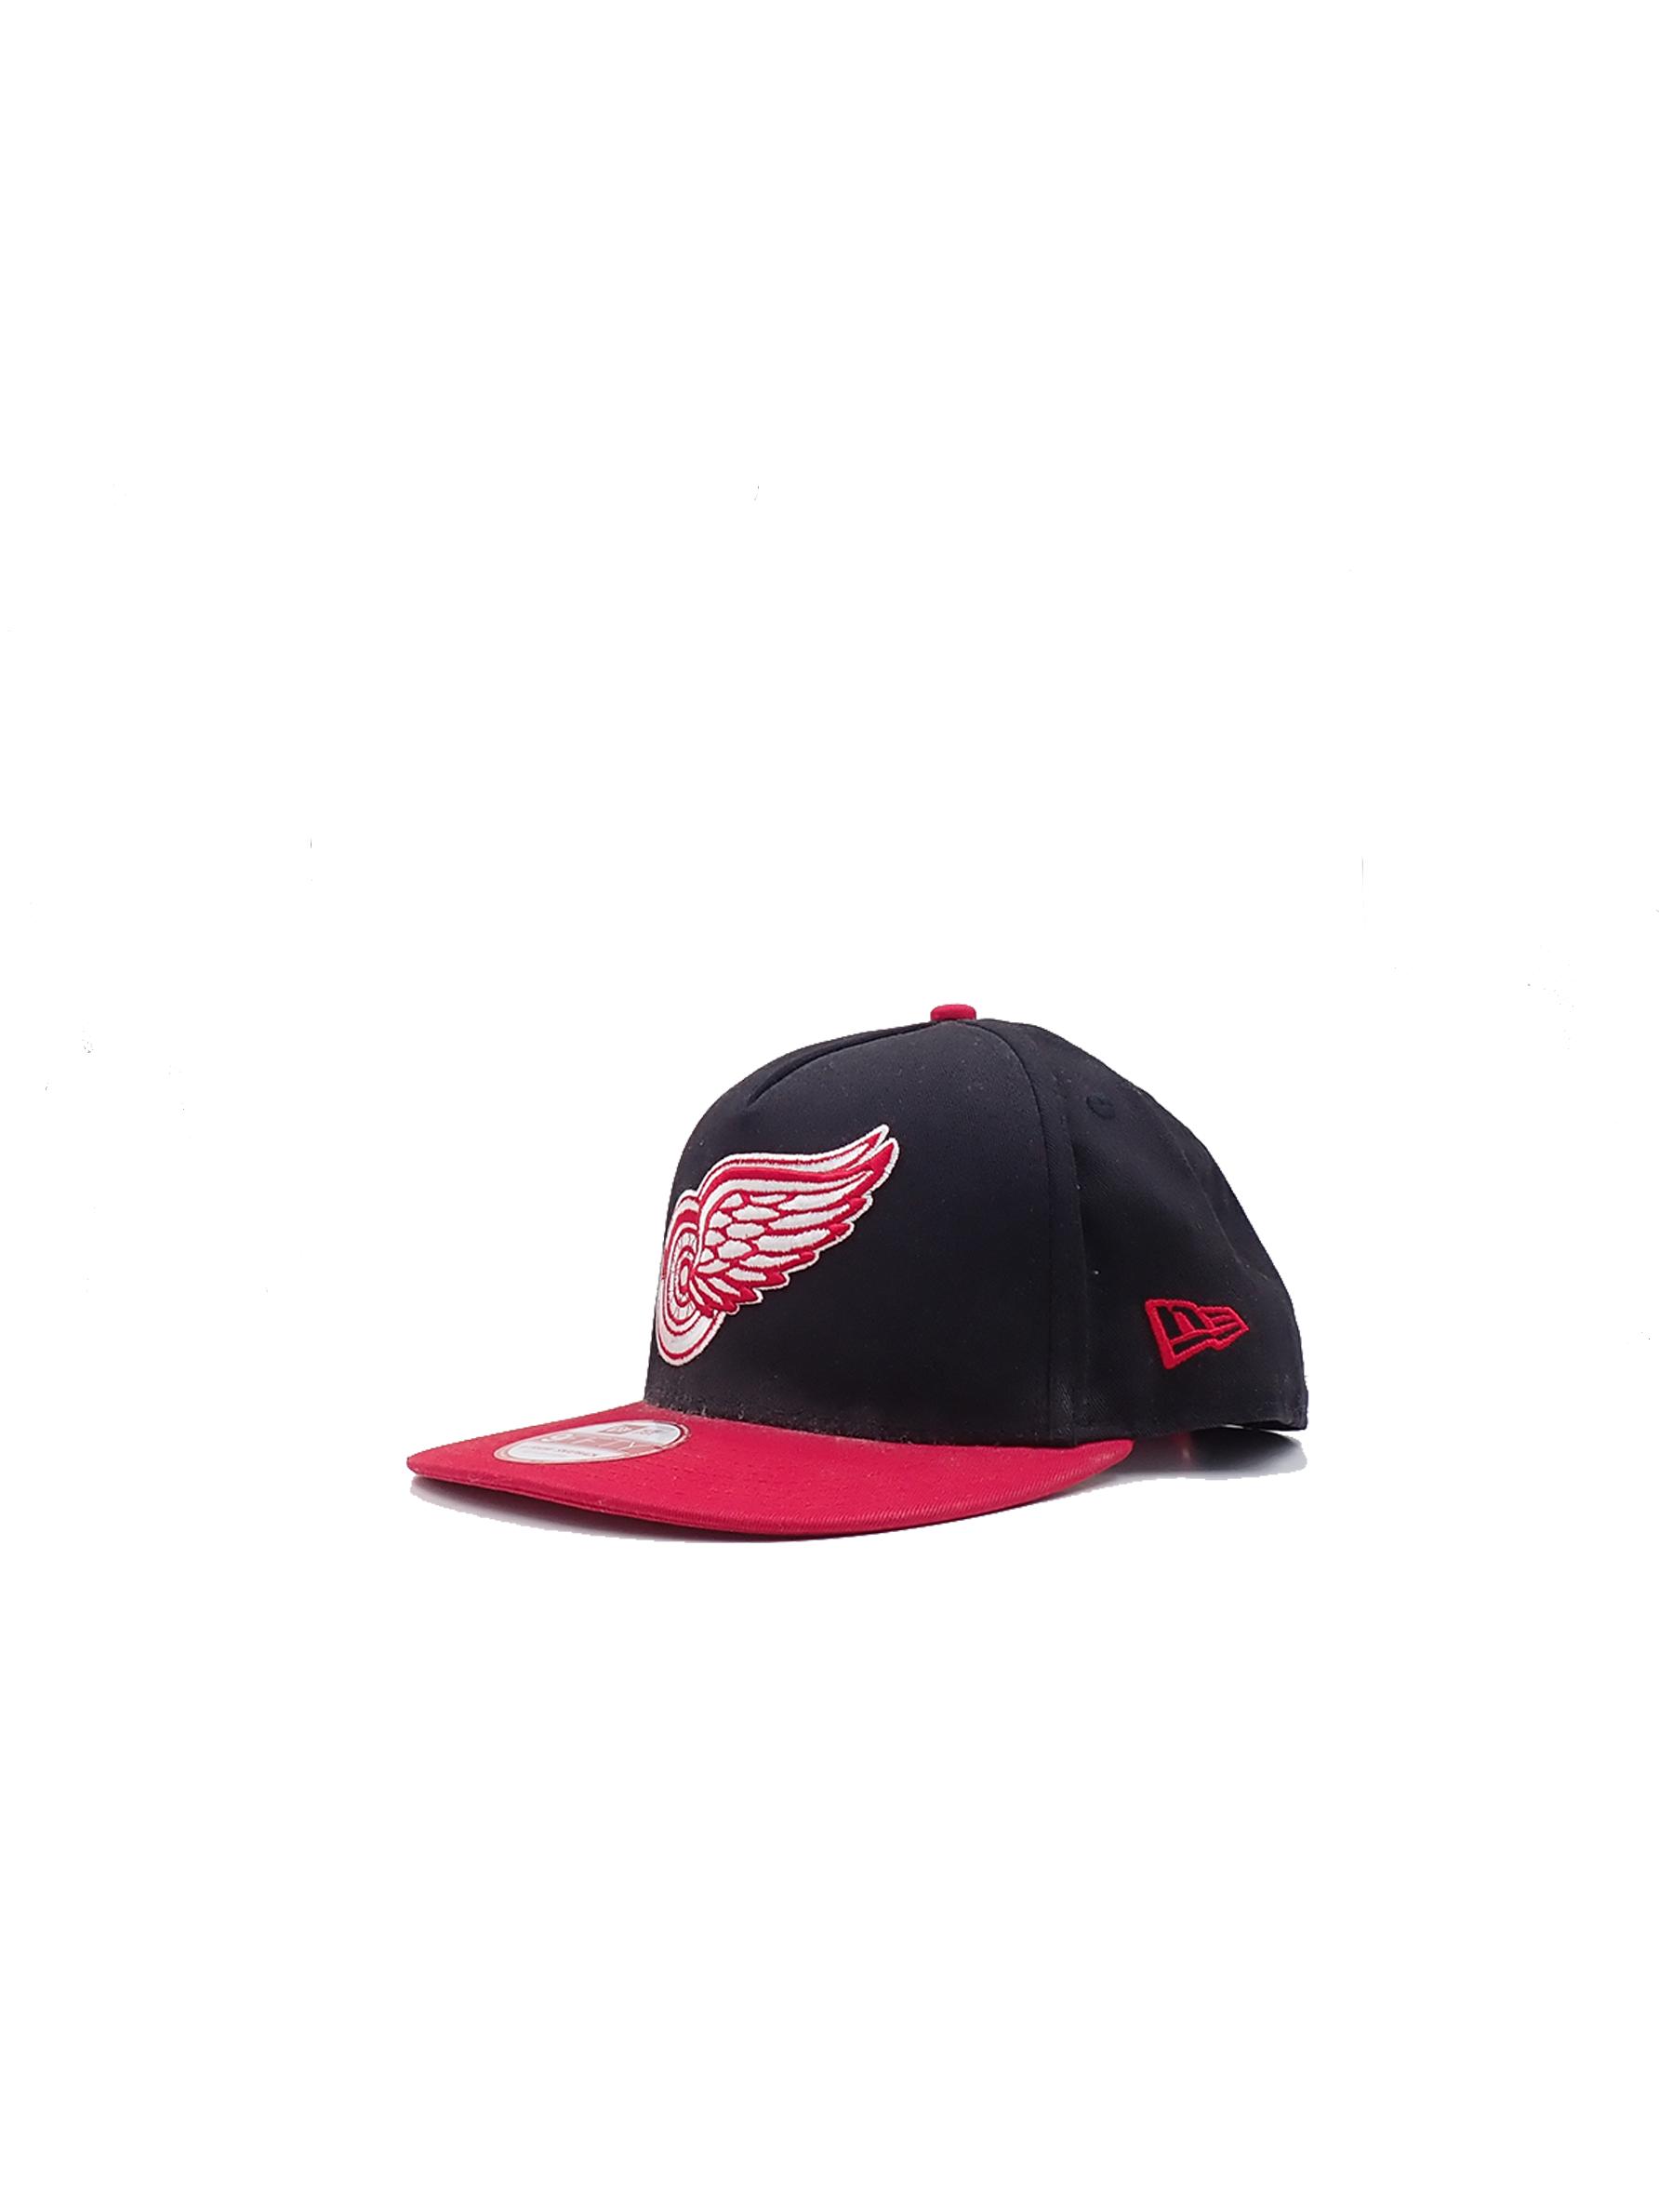 Detroit Red Wings New Era Cap